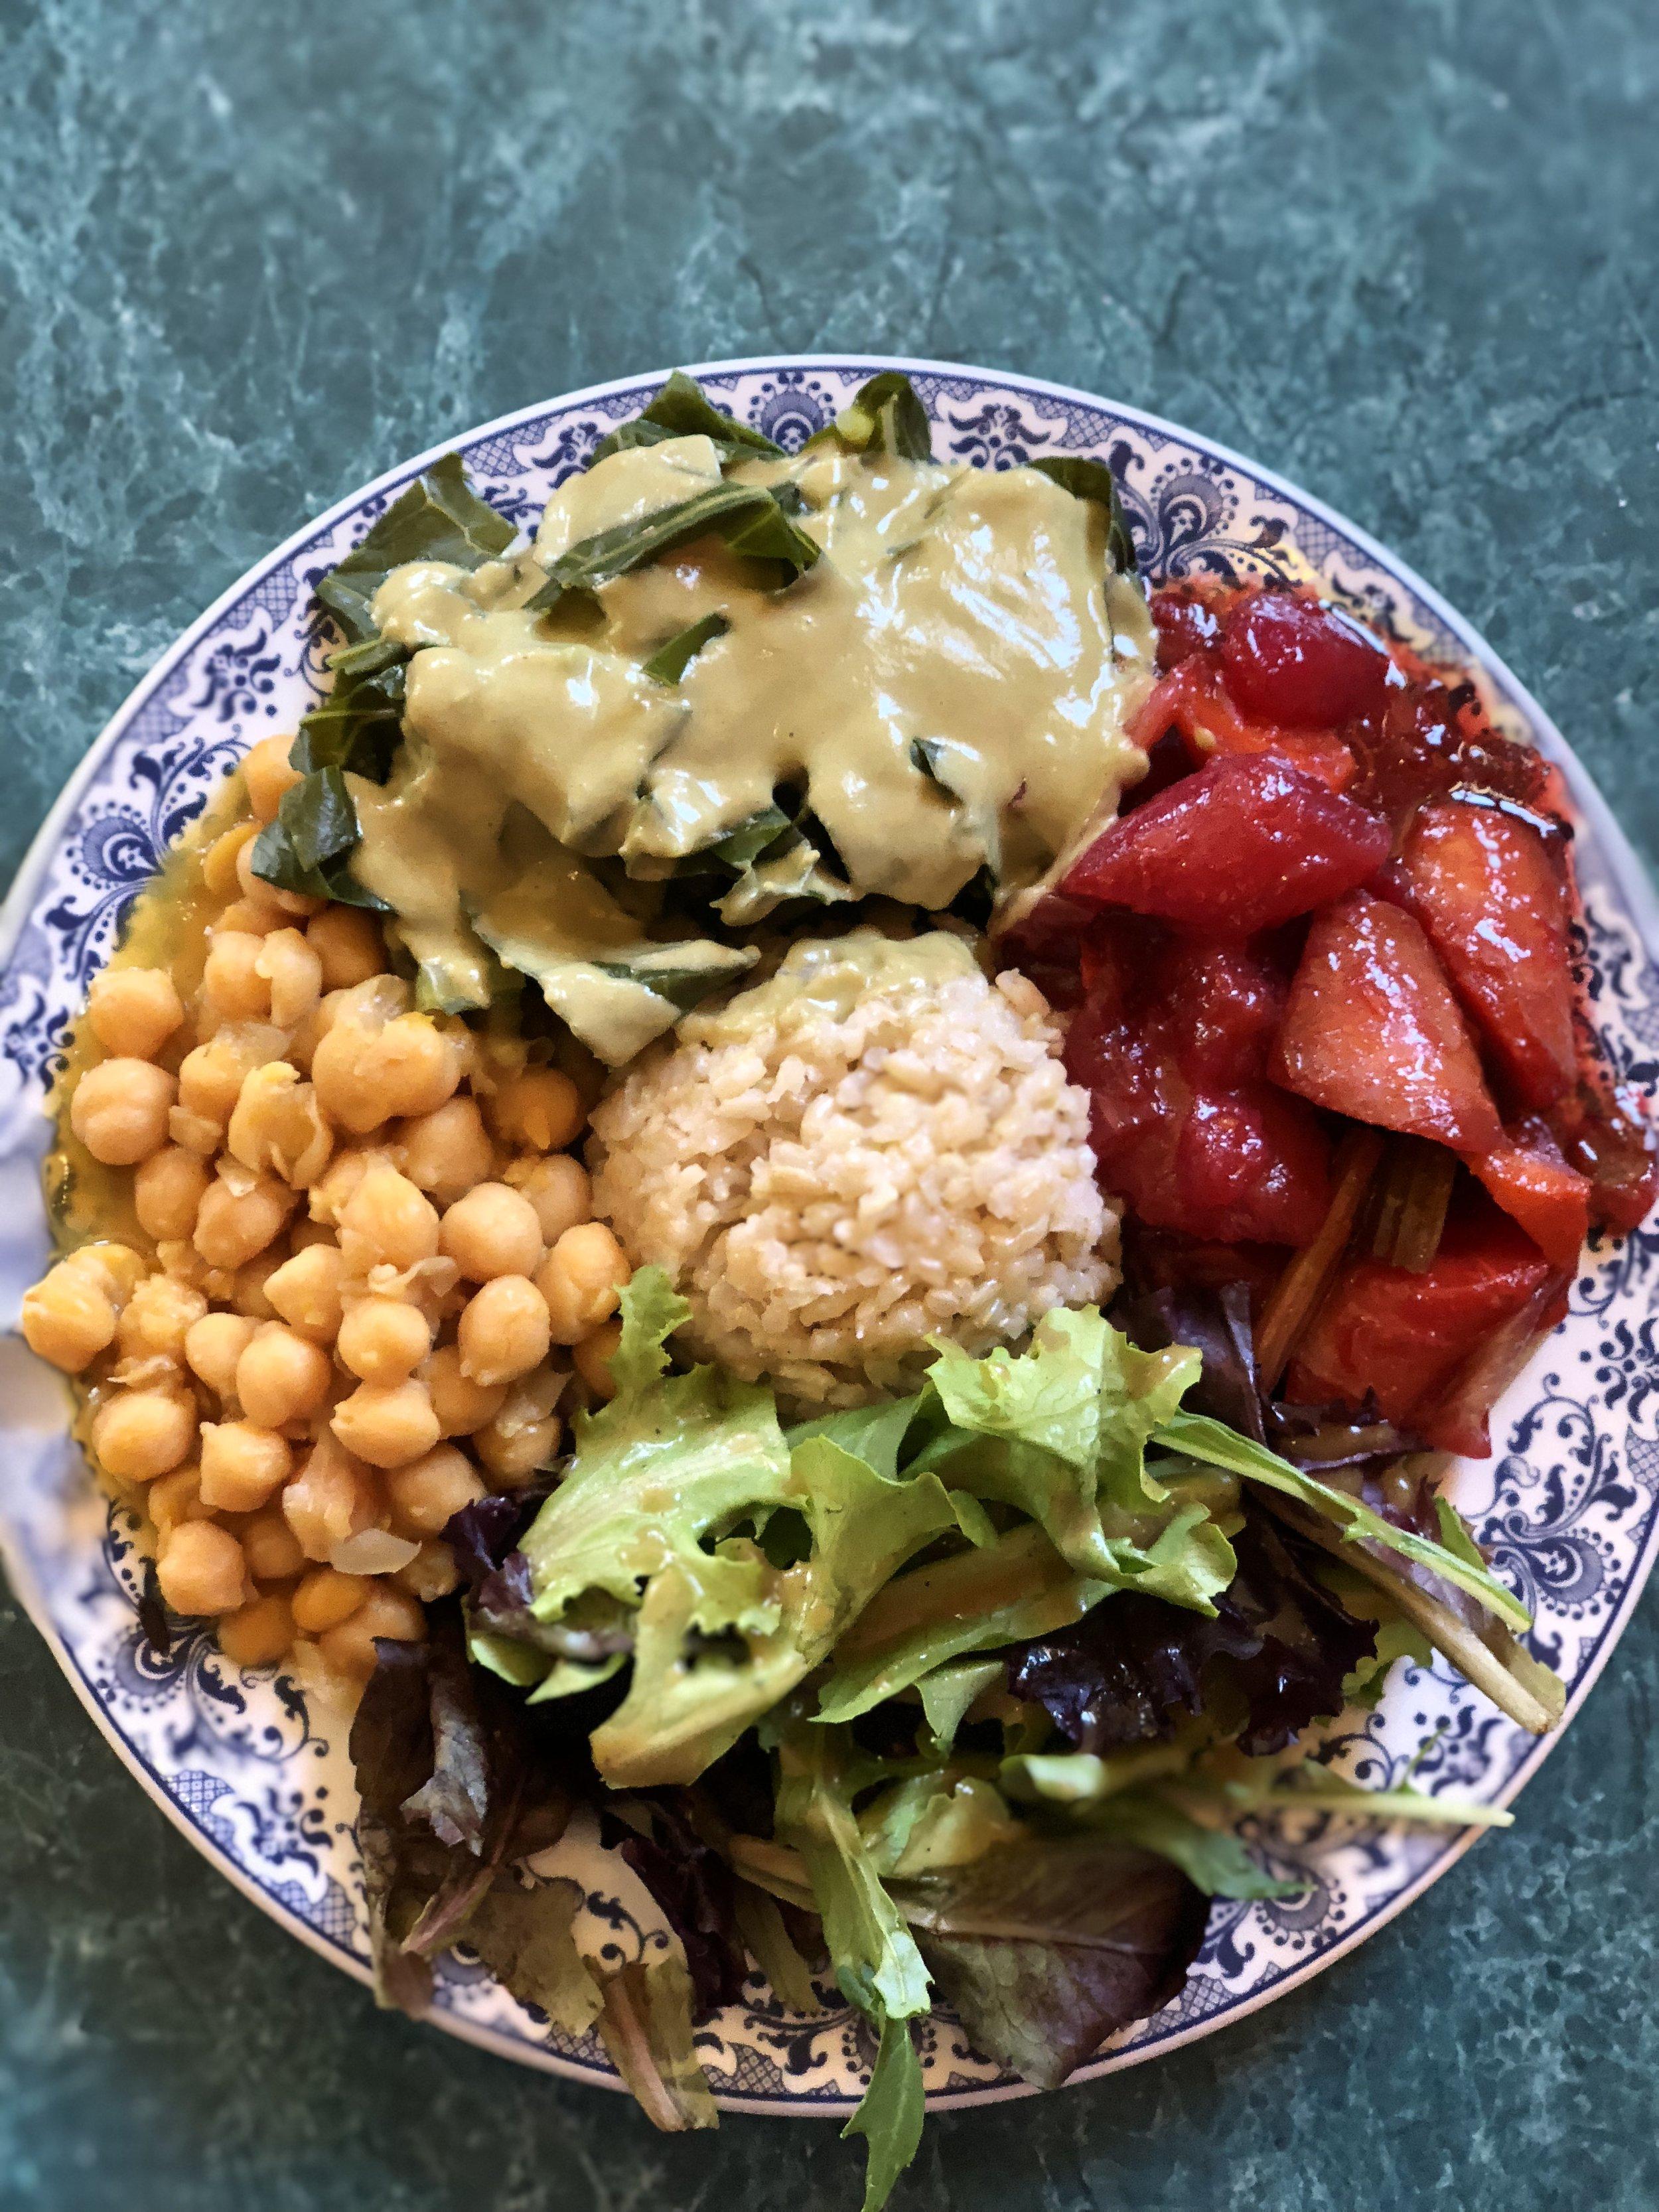 brown rice, garbanzo beans with onion & squash, sautéed carrot, celery, beet & daikon, steamed collards with leek sauce, & green salad